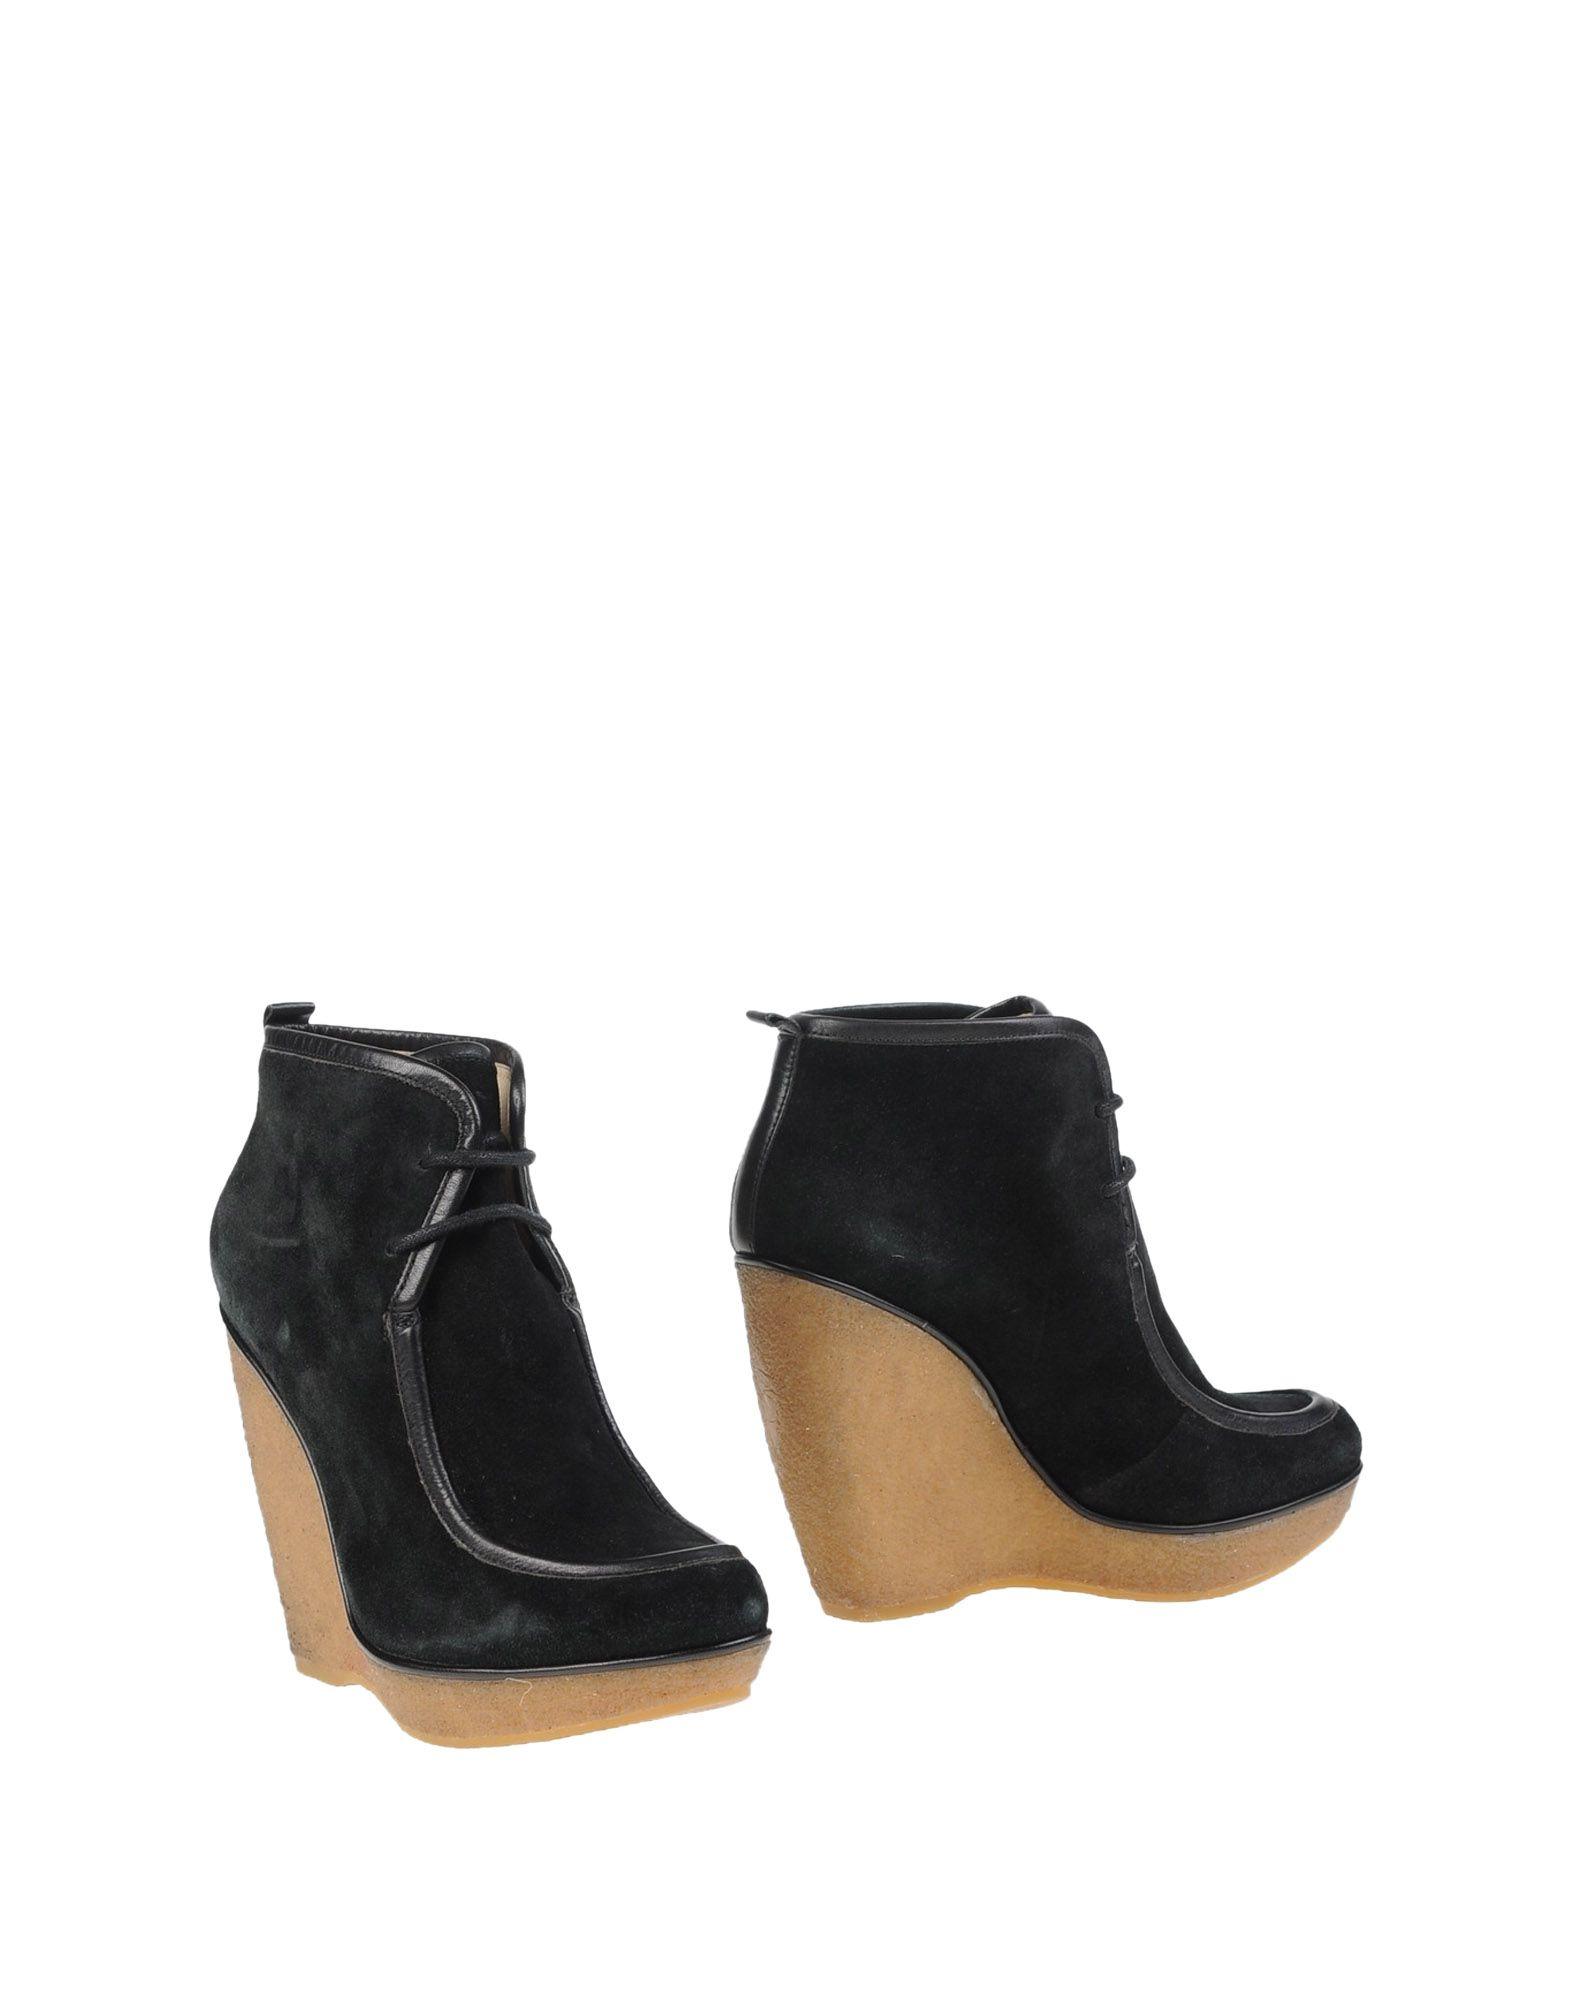 lyst kors by michael kors ankle boots in black. Black Bedroom Furniture Sets. Home Design Ideas